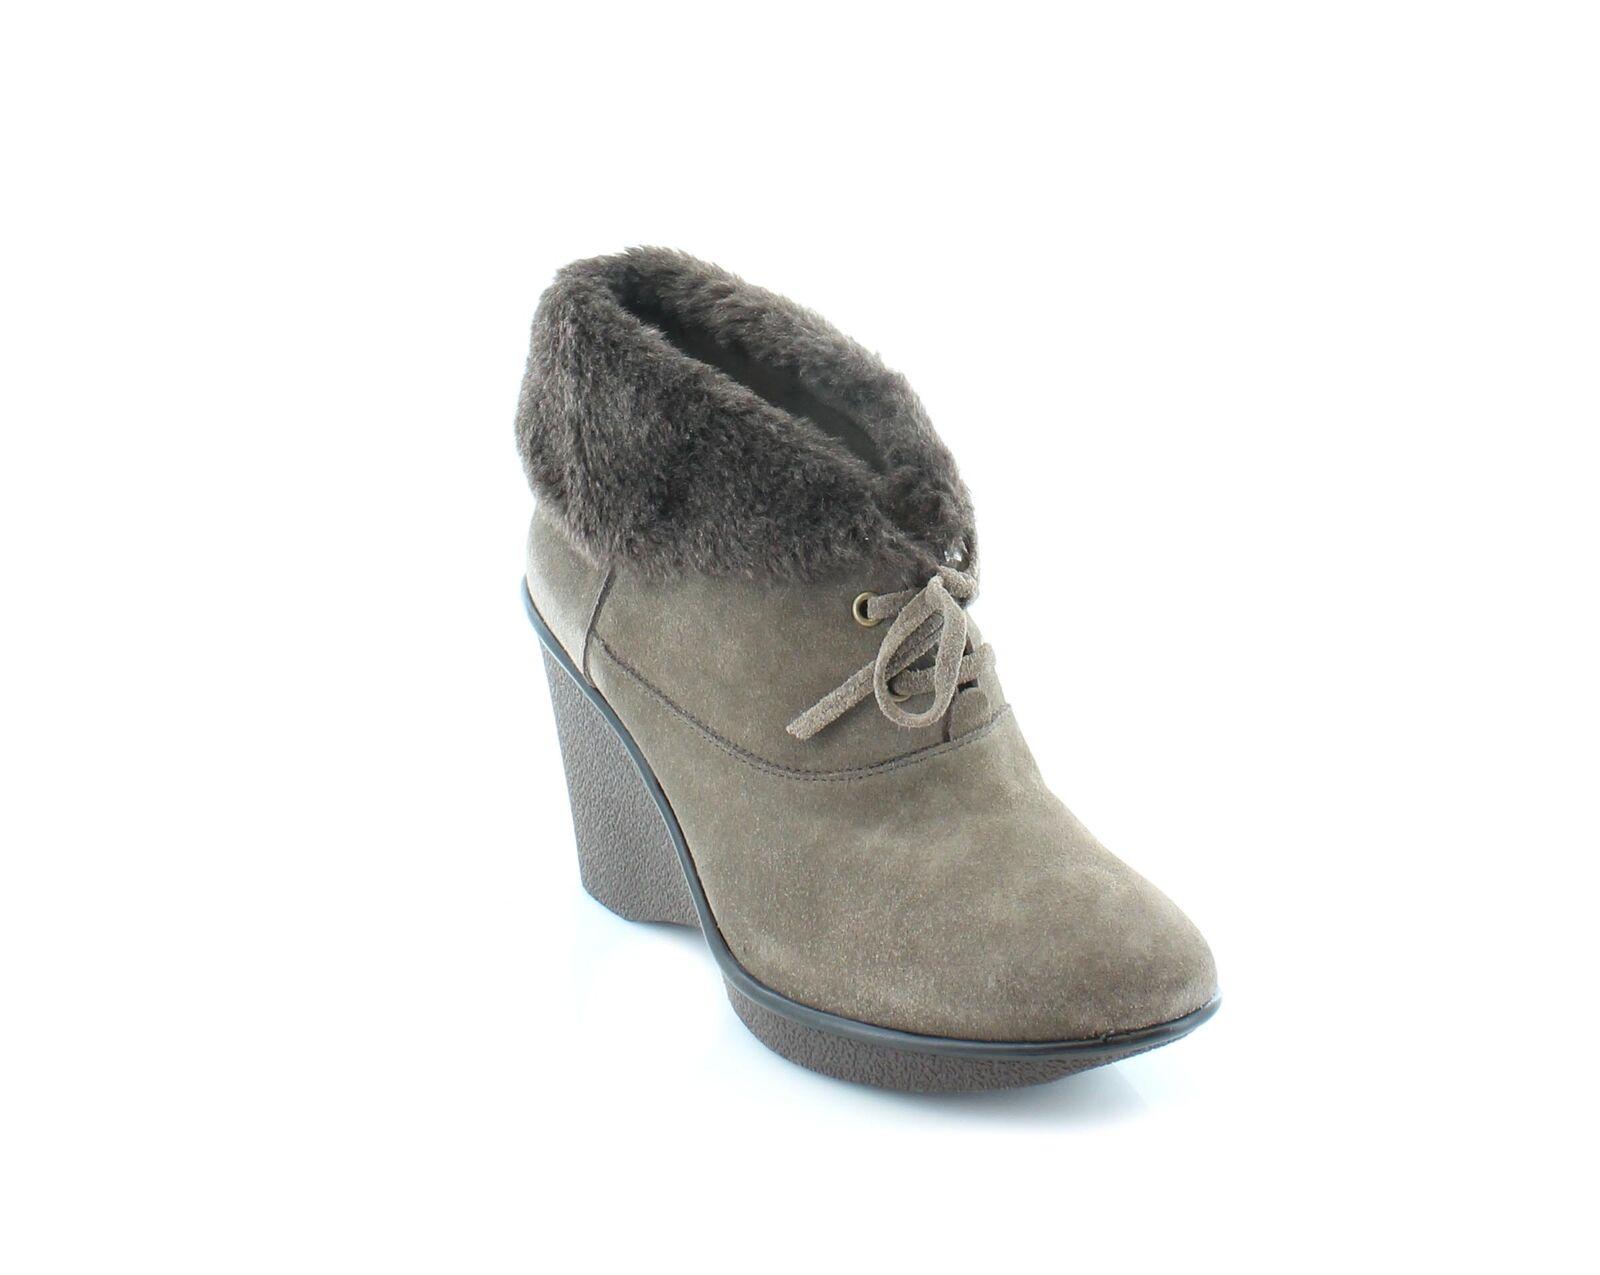 B. Makowsky Nellie Women's Boots Brown Size 8.5 W